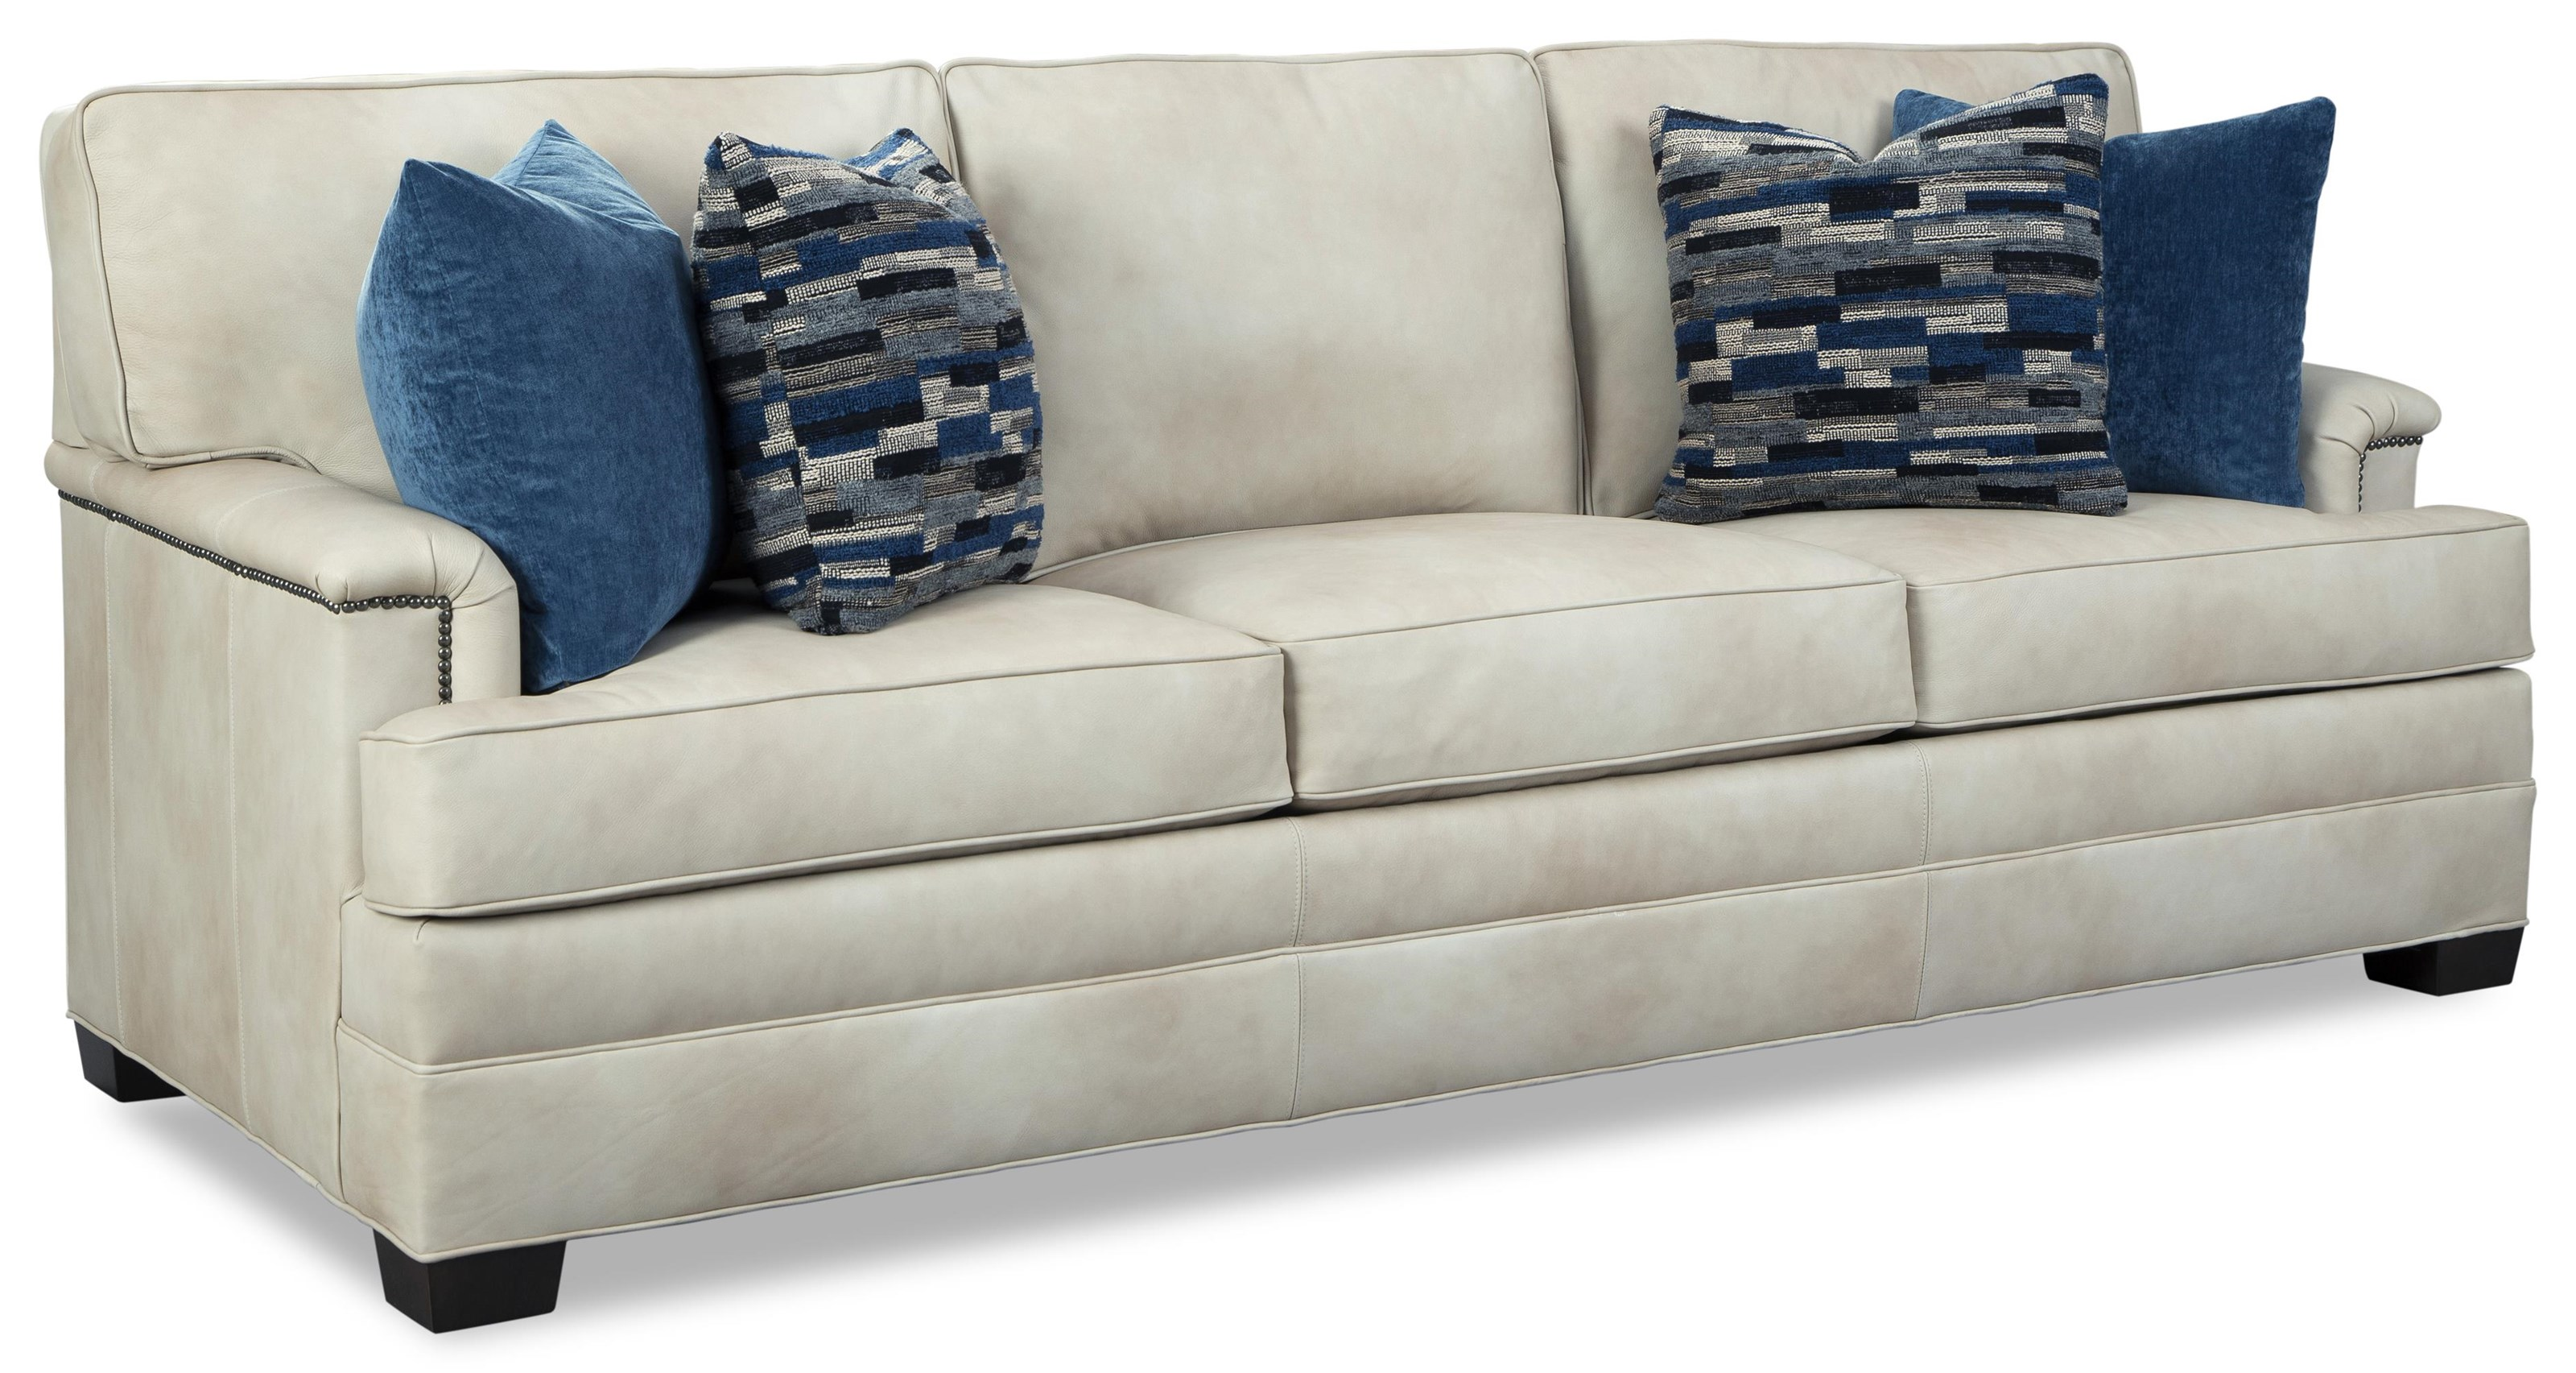 2061 Sofa by Huntington House at Baer's Furniture